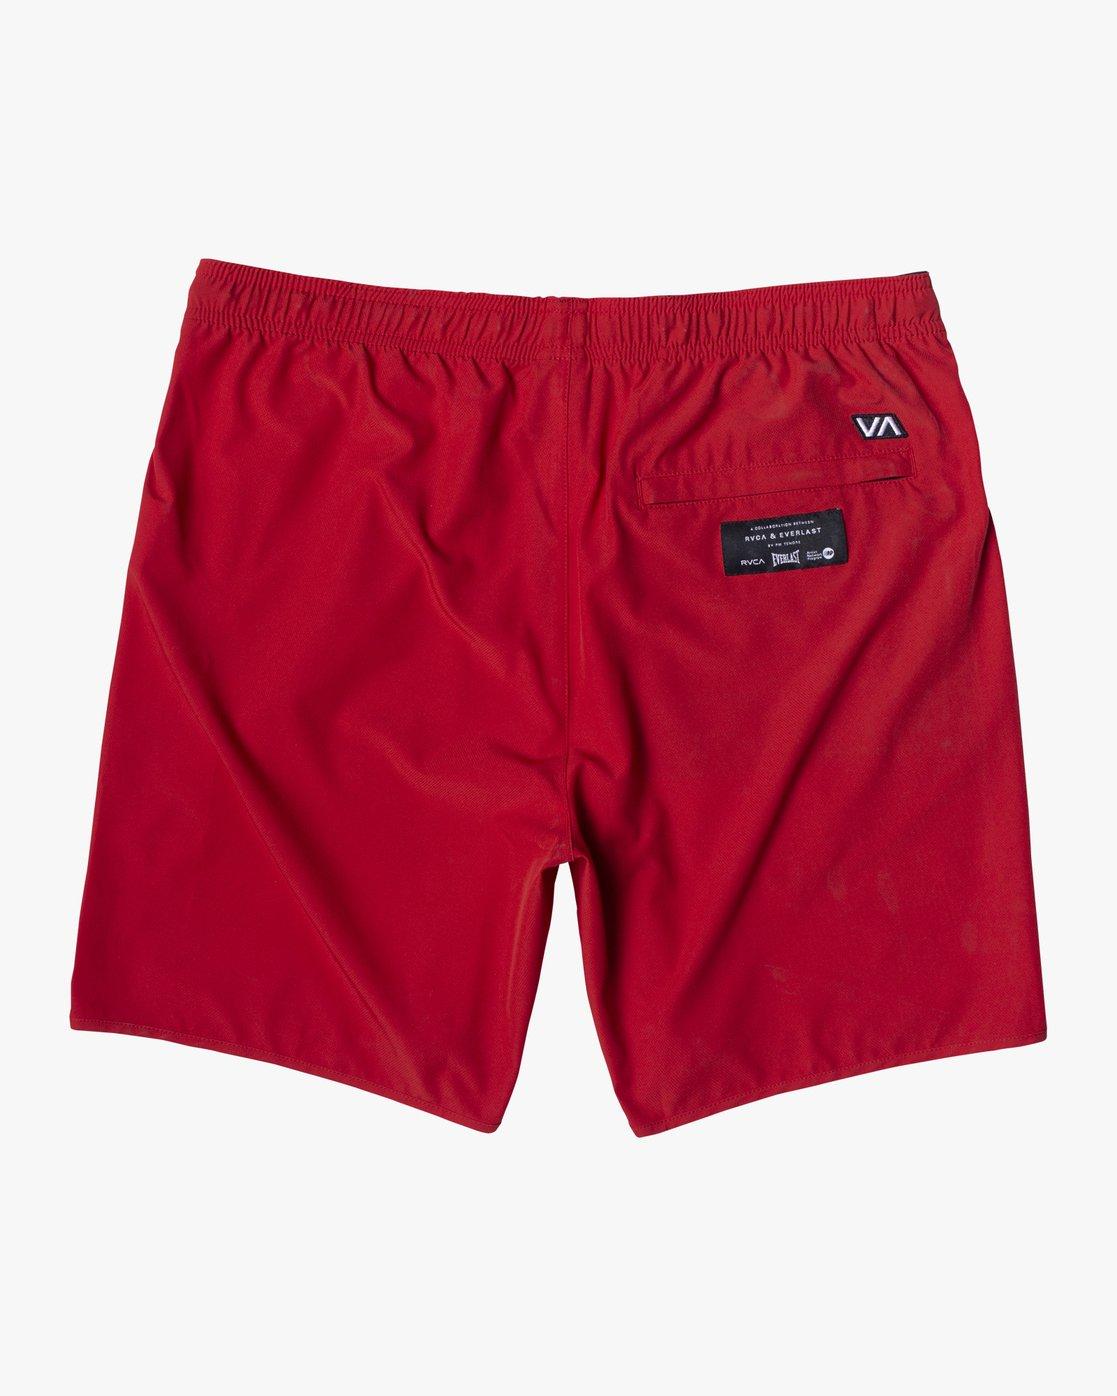 "3 Everlast Yogger IV 17"" - Workout Shorts for Men Red U4WKEARVF0 RVCA"